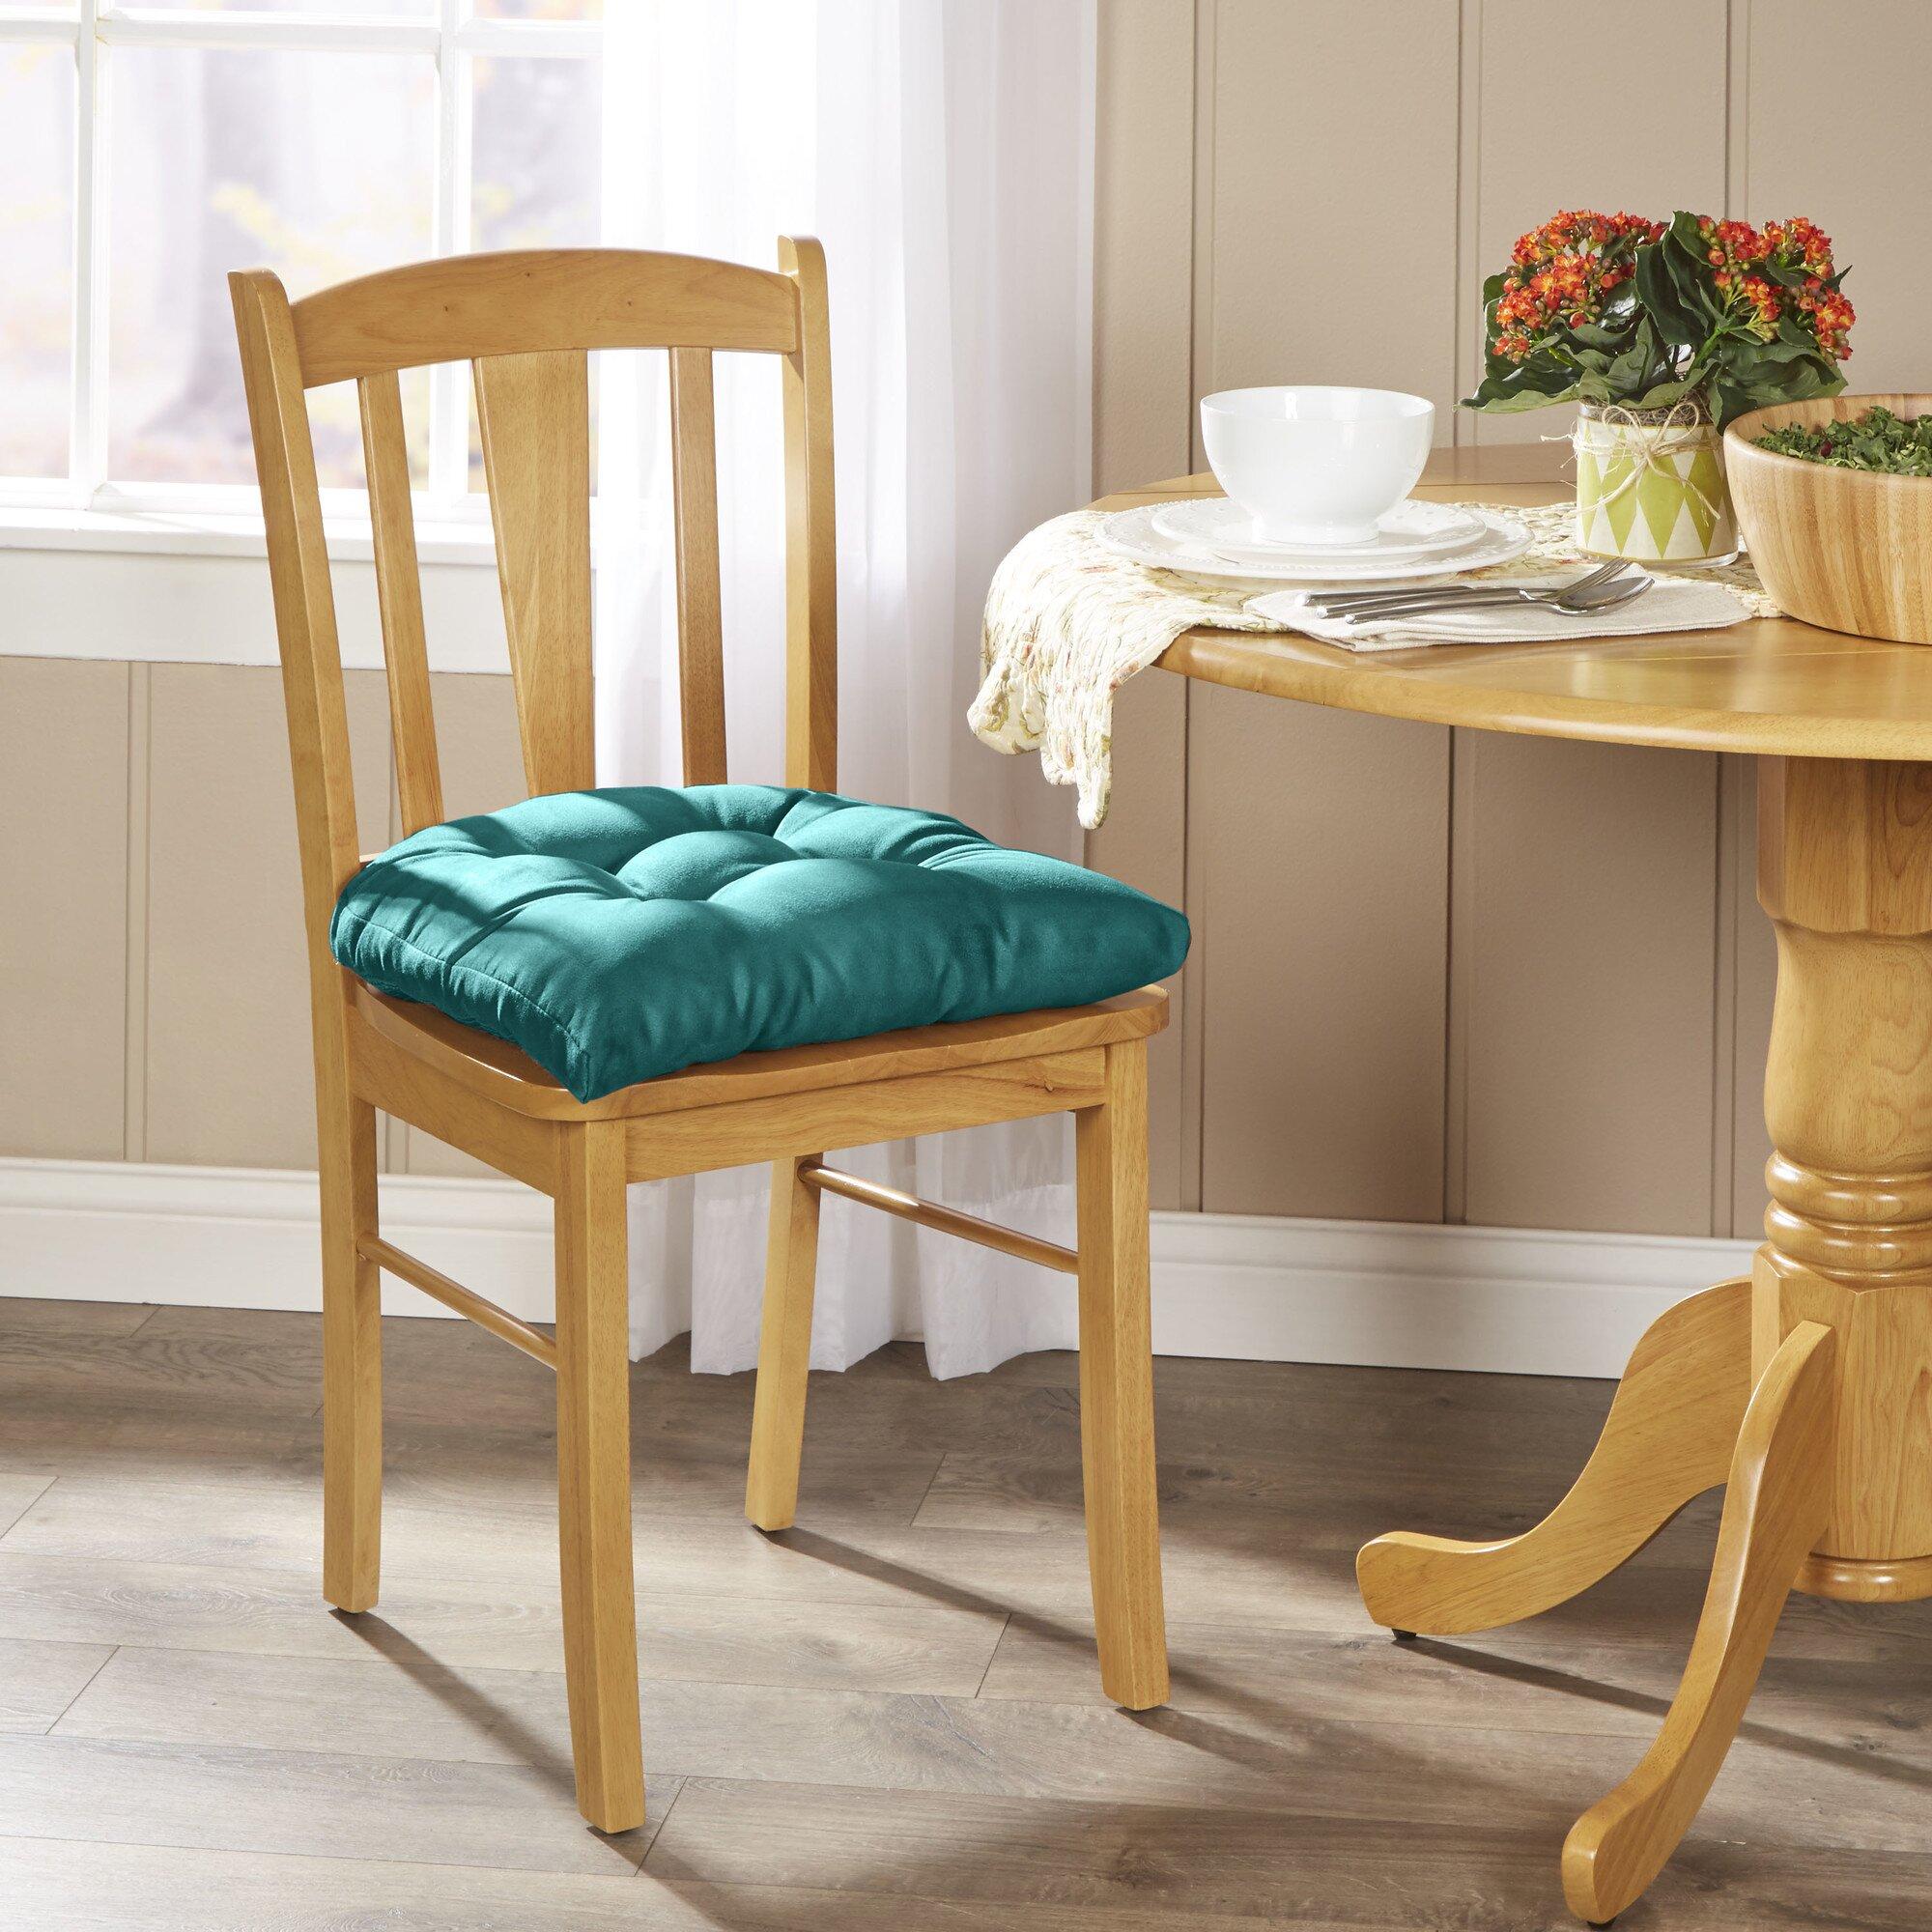 Wayfair Basics Wayfair Basics Chair Cushion & Reviews